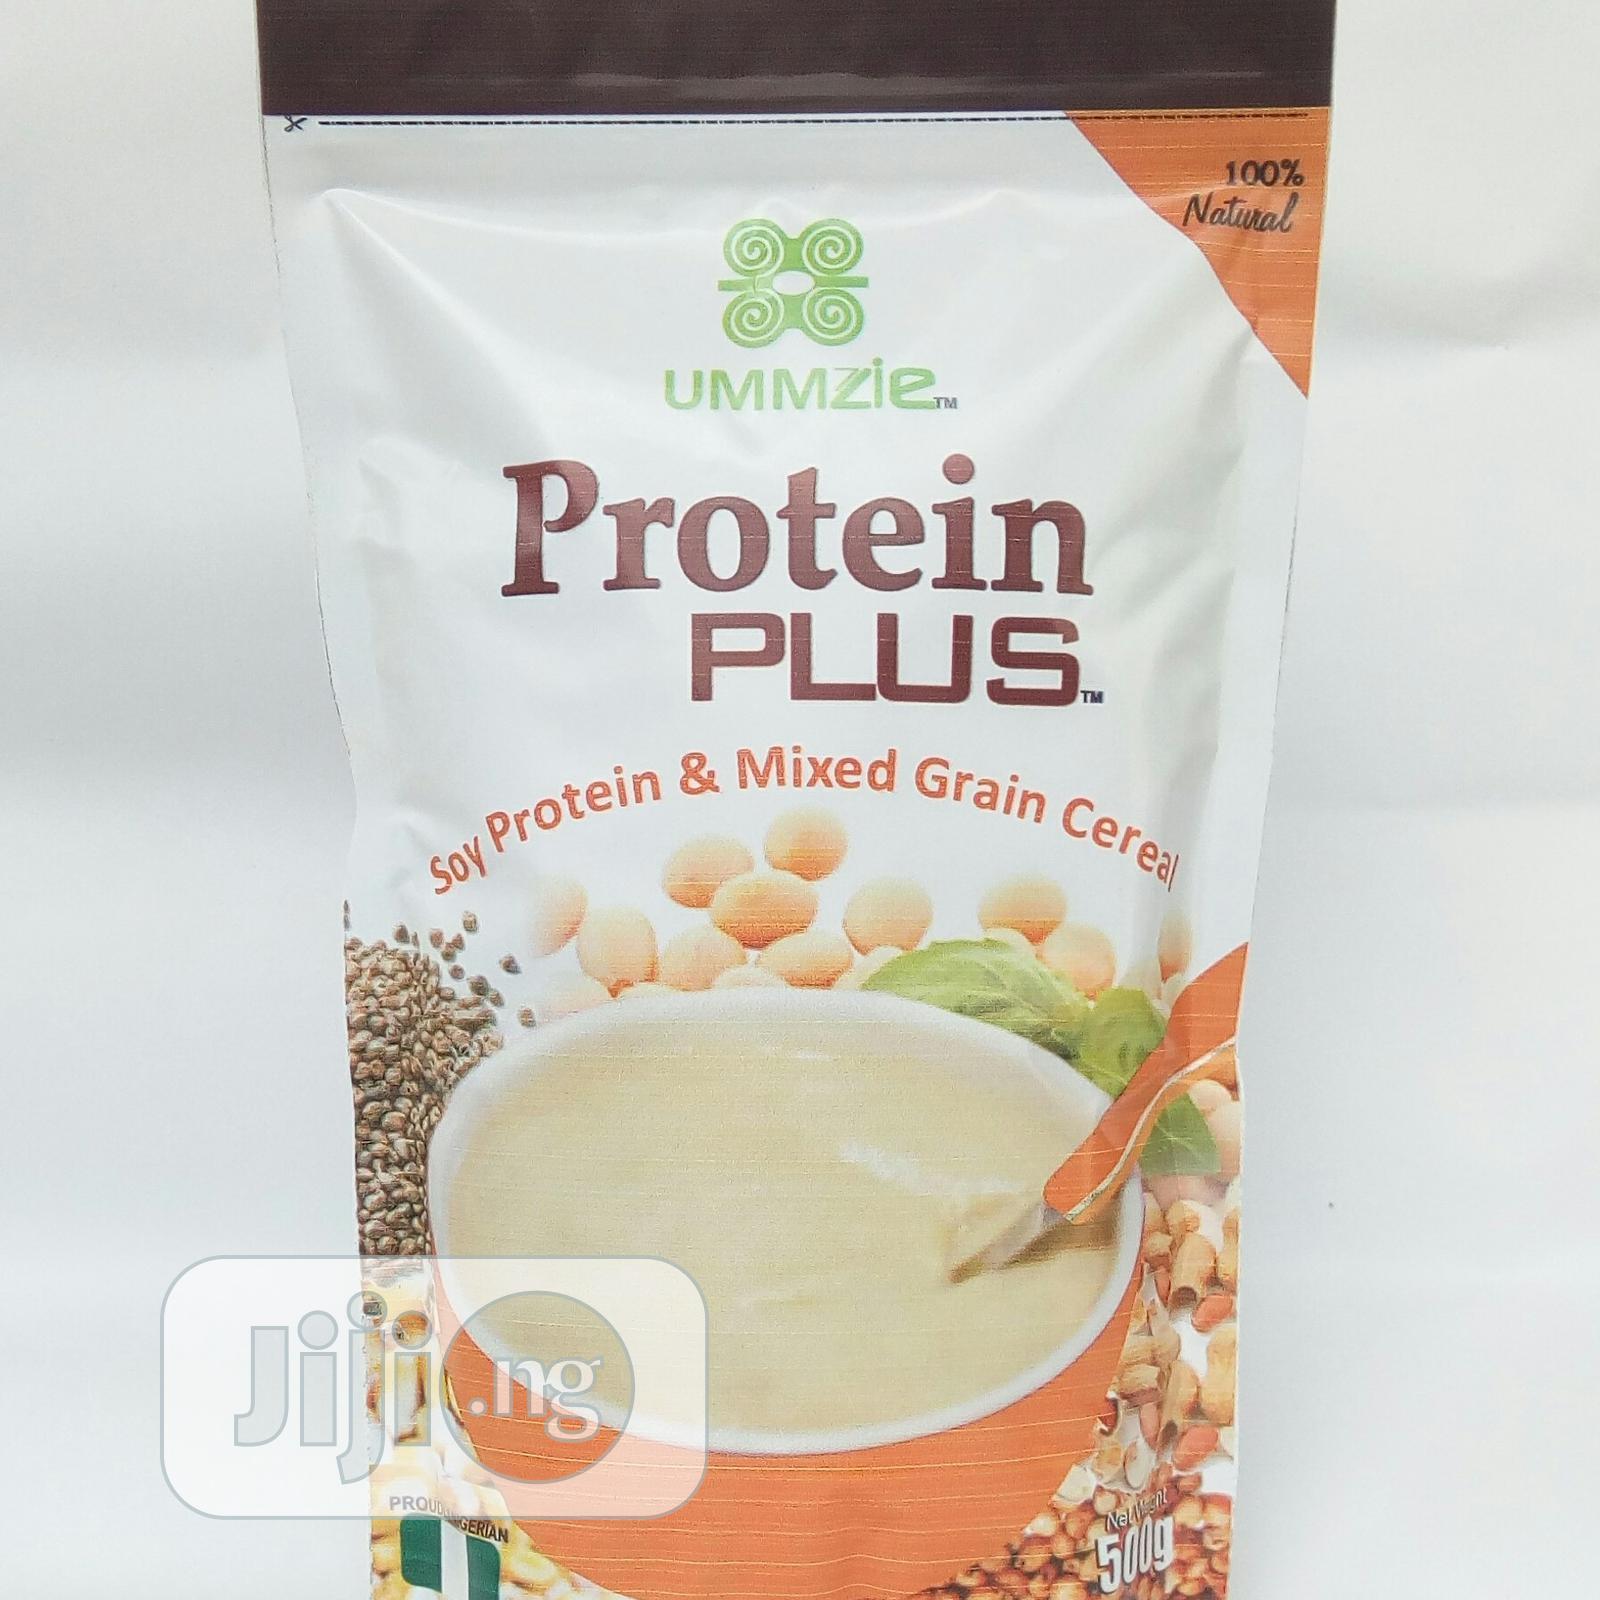 Ummzie Protein Plus Cereal